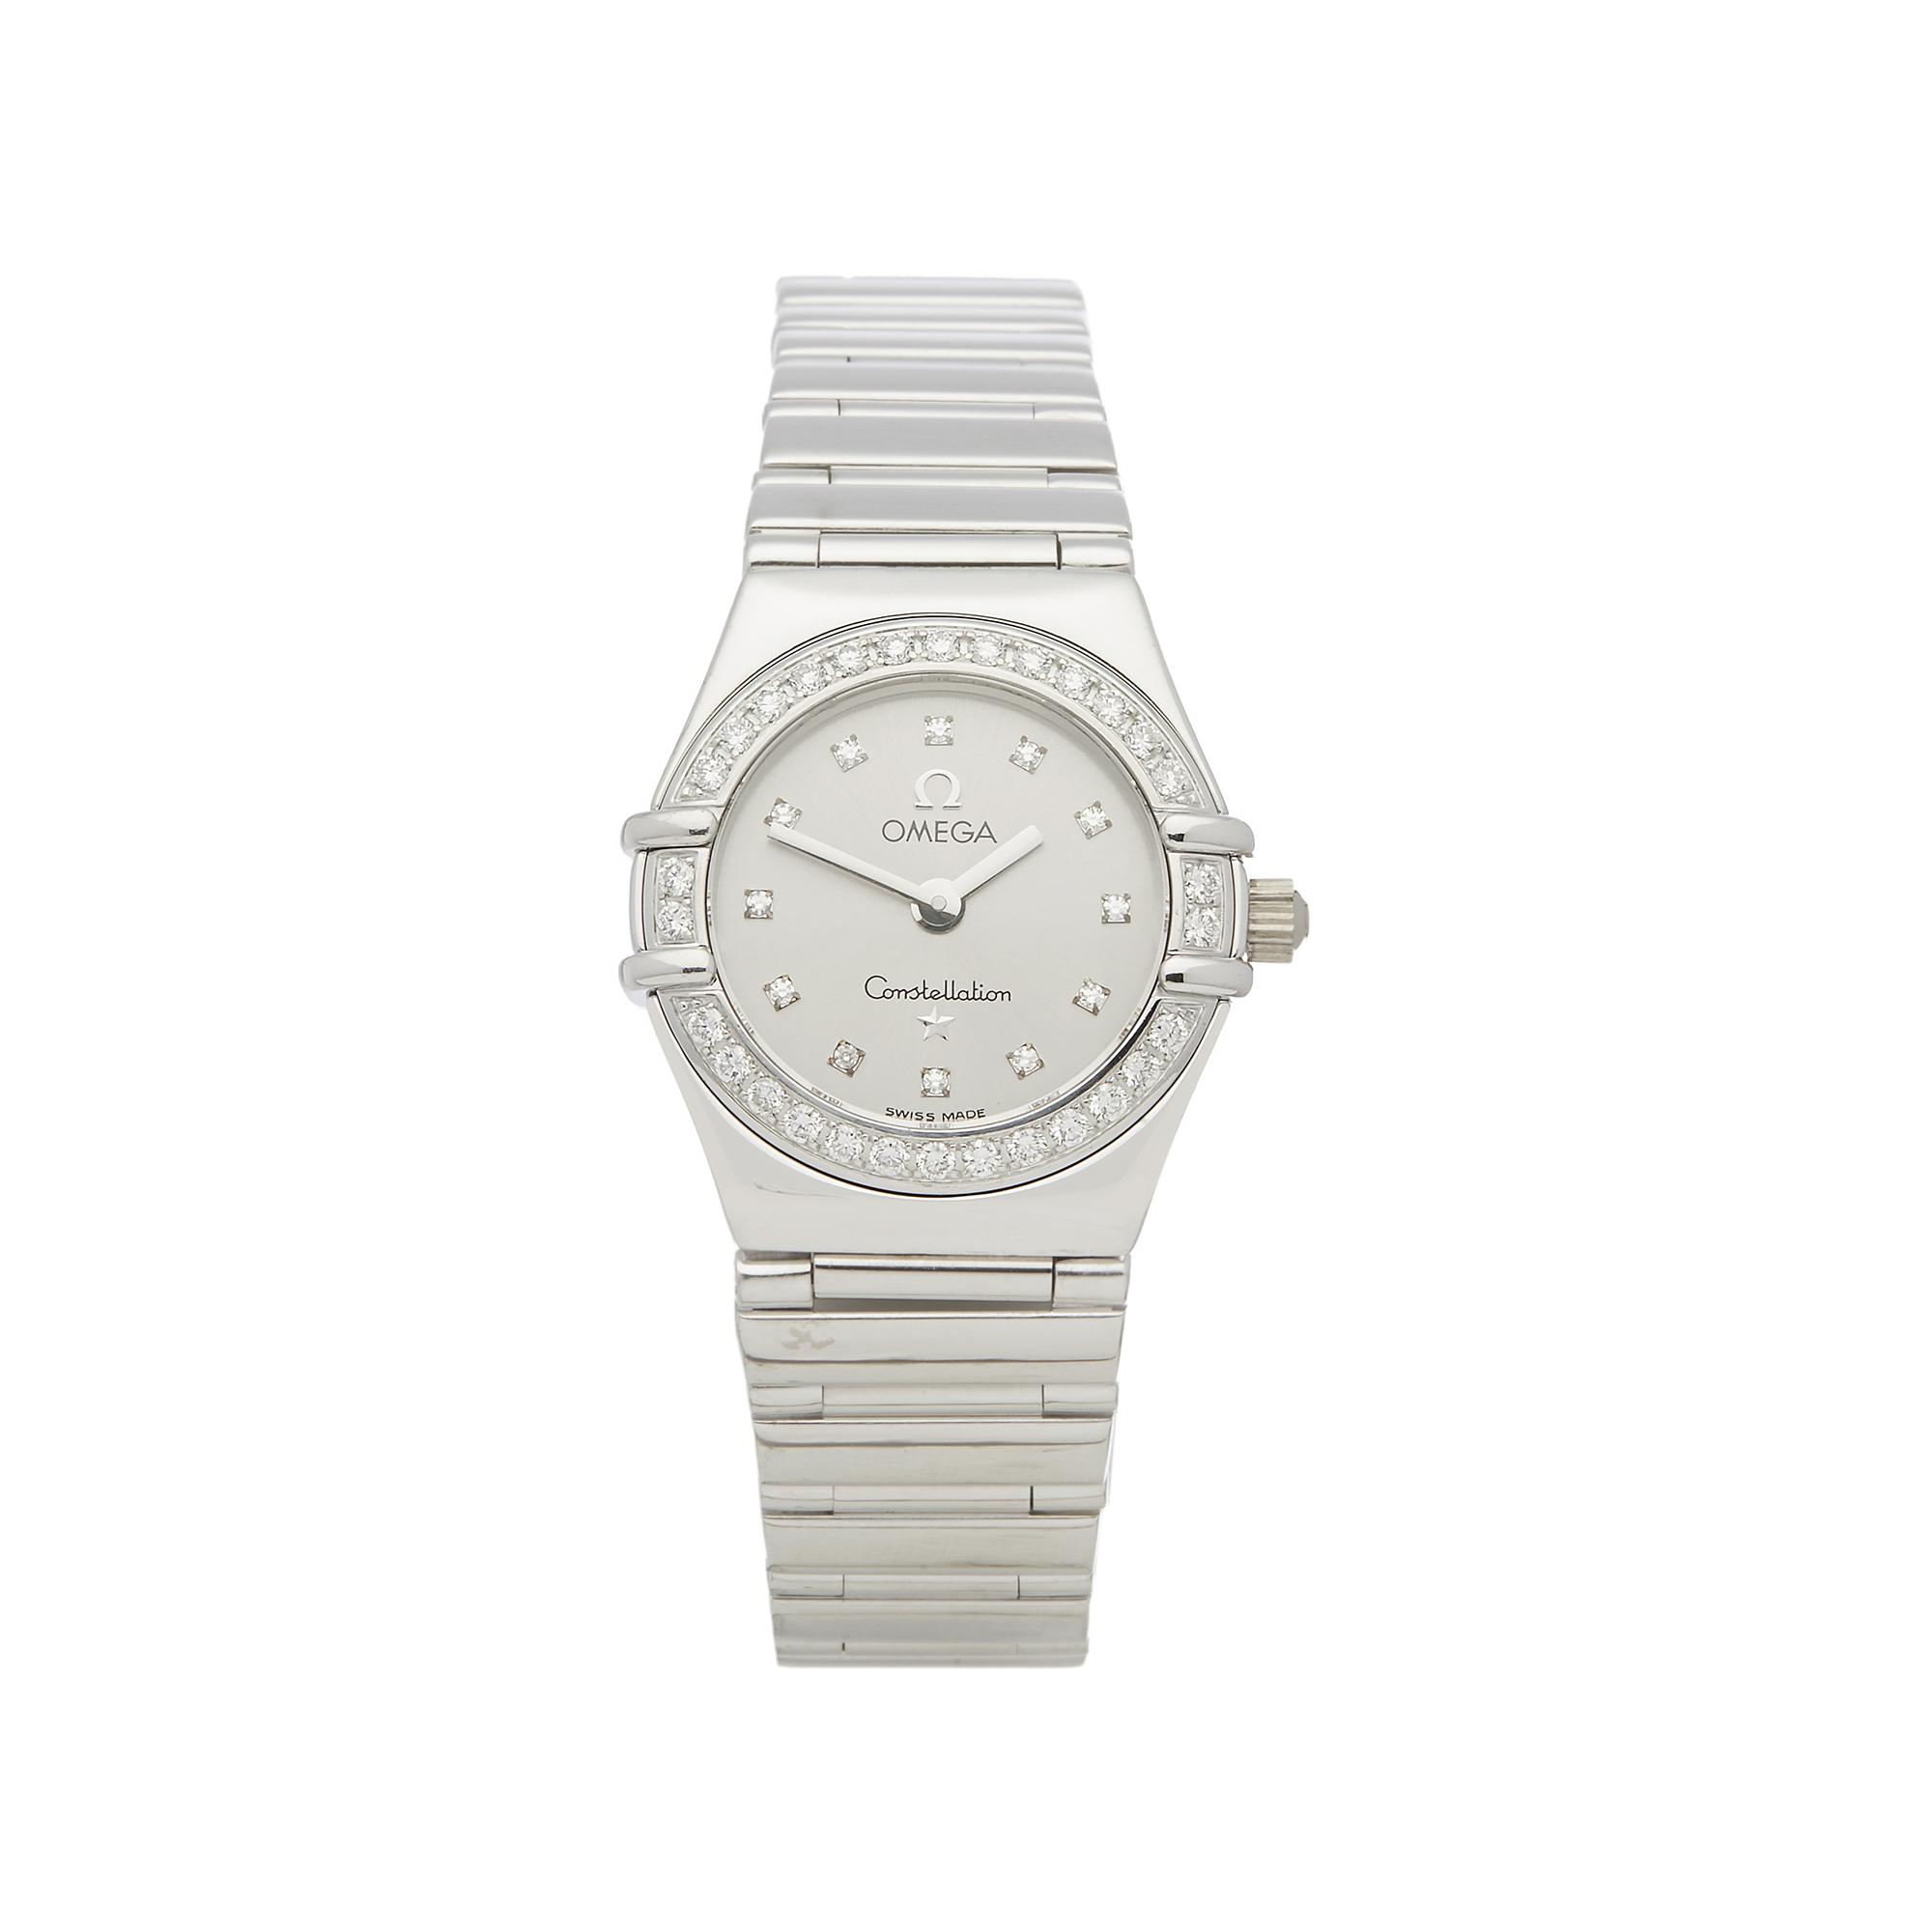 Omega Constellation 0 1165.36 Ladies White Gold Diamond Watch - Image 7 of 7